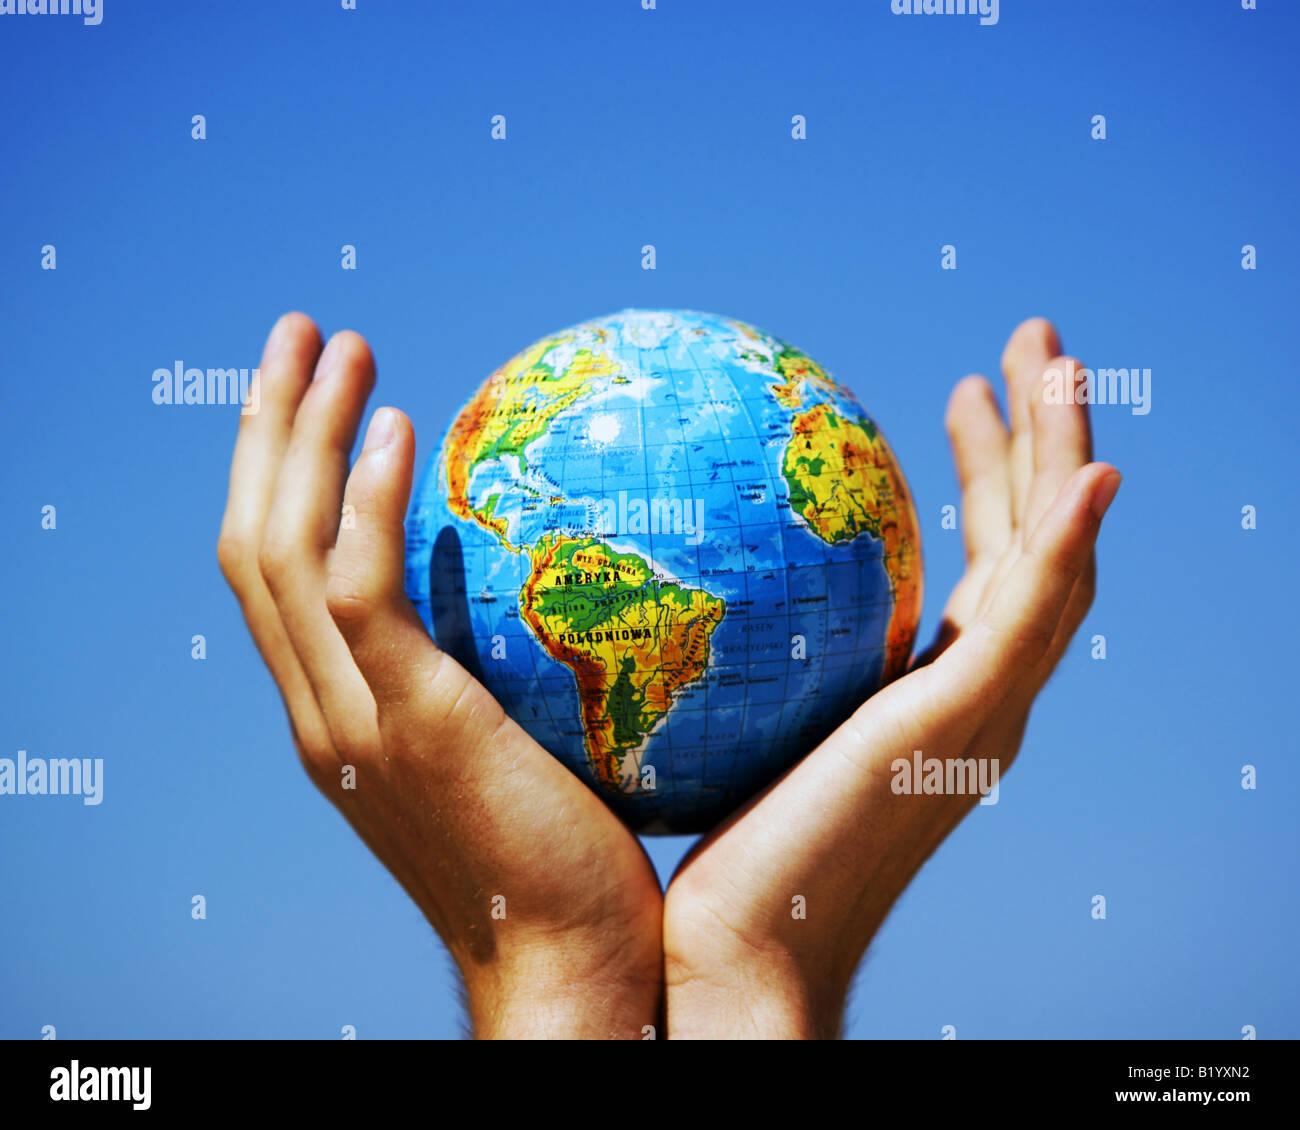 Erdkugel in Händen geschützt. Globus-Schutzkonzept, recycling, globalen Themen, Umwelt / Umwelt Themen Stockbild